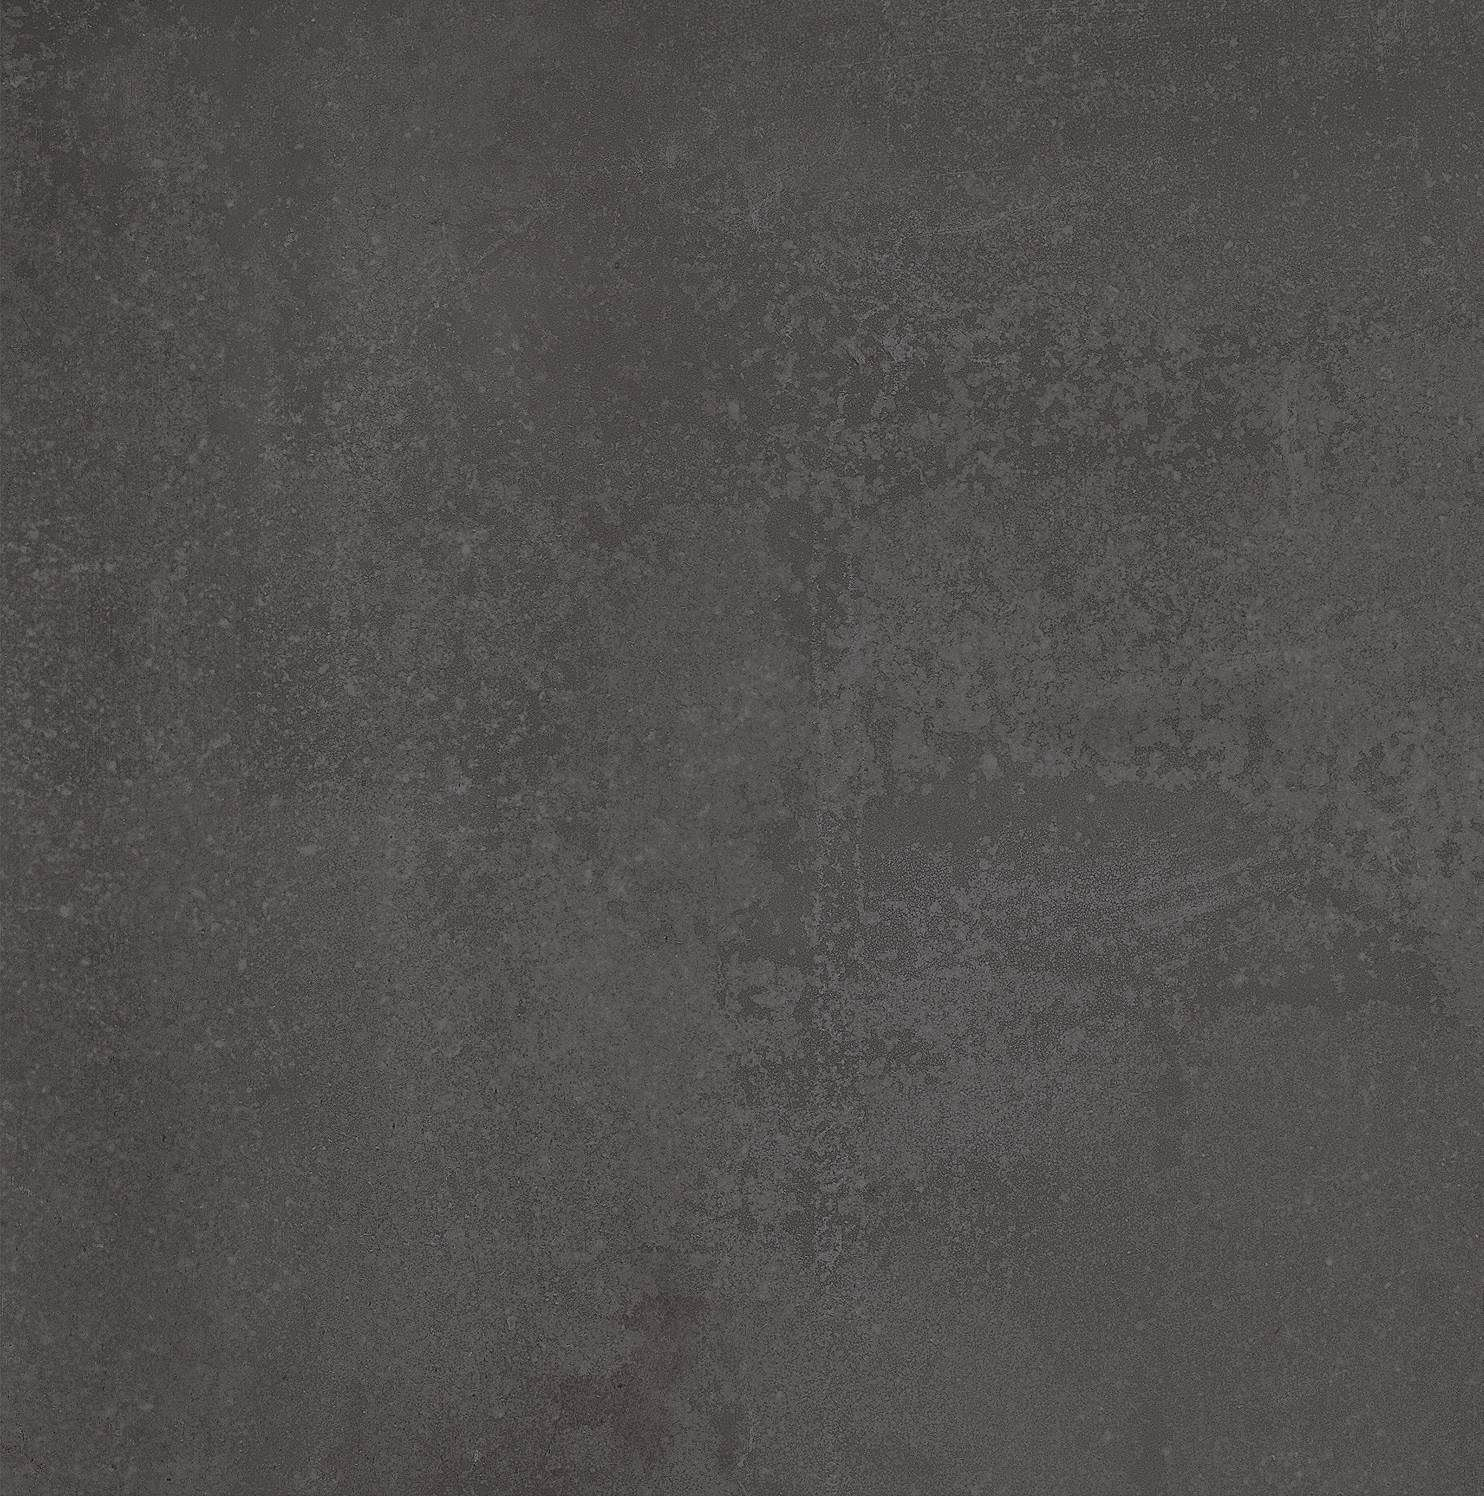 Betonlook tegel Antraciet 60x60cm (Keramiek)